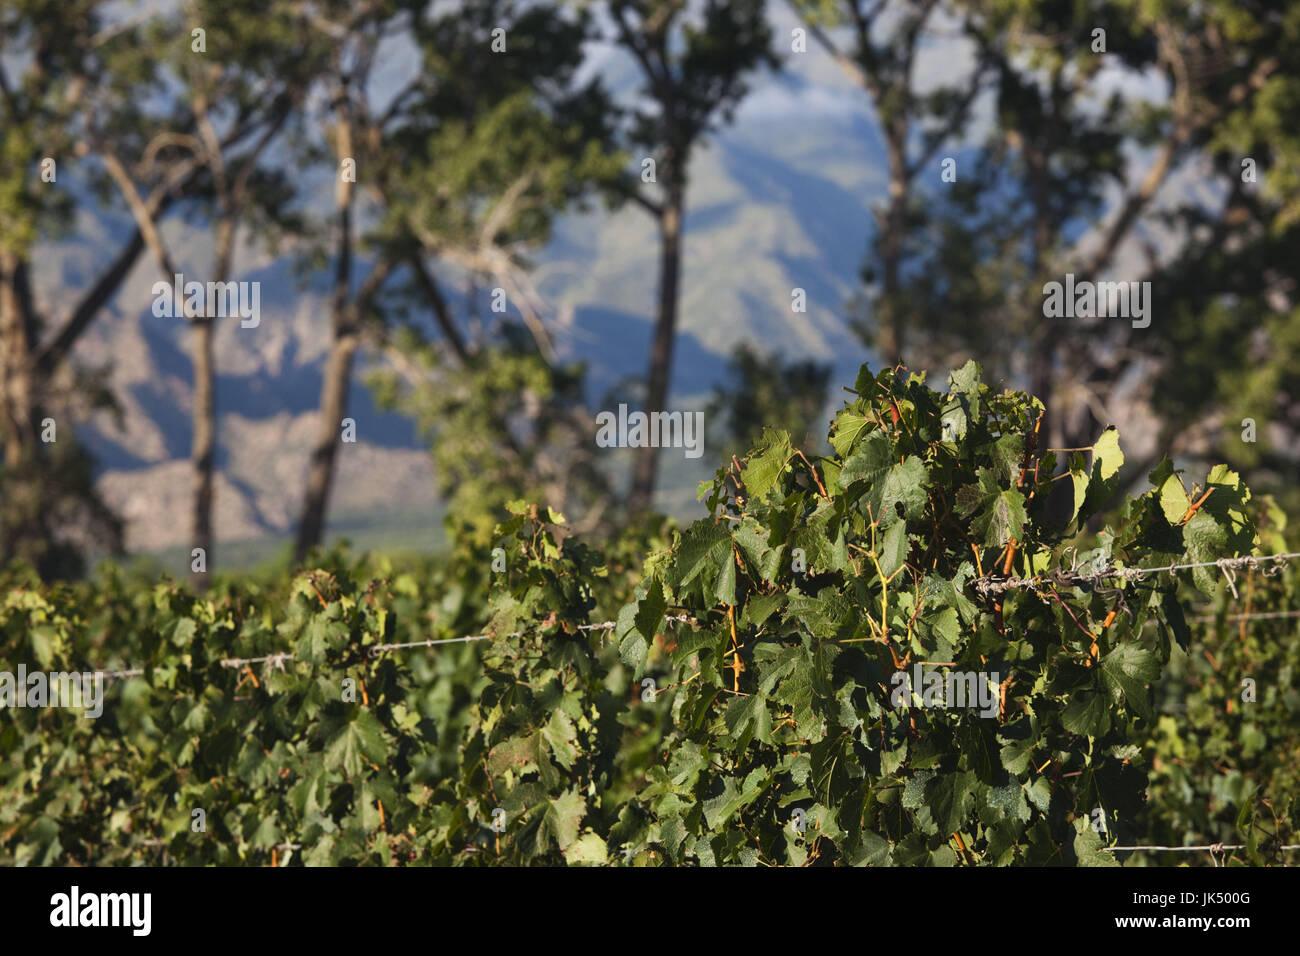 Argentina, Salta Province, Valles Calchaquies, Cafayate, vineyard view, morning - Stock Image